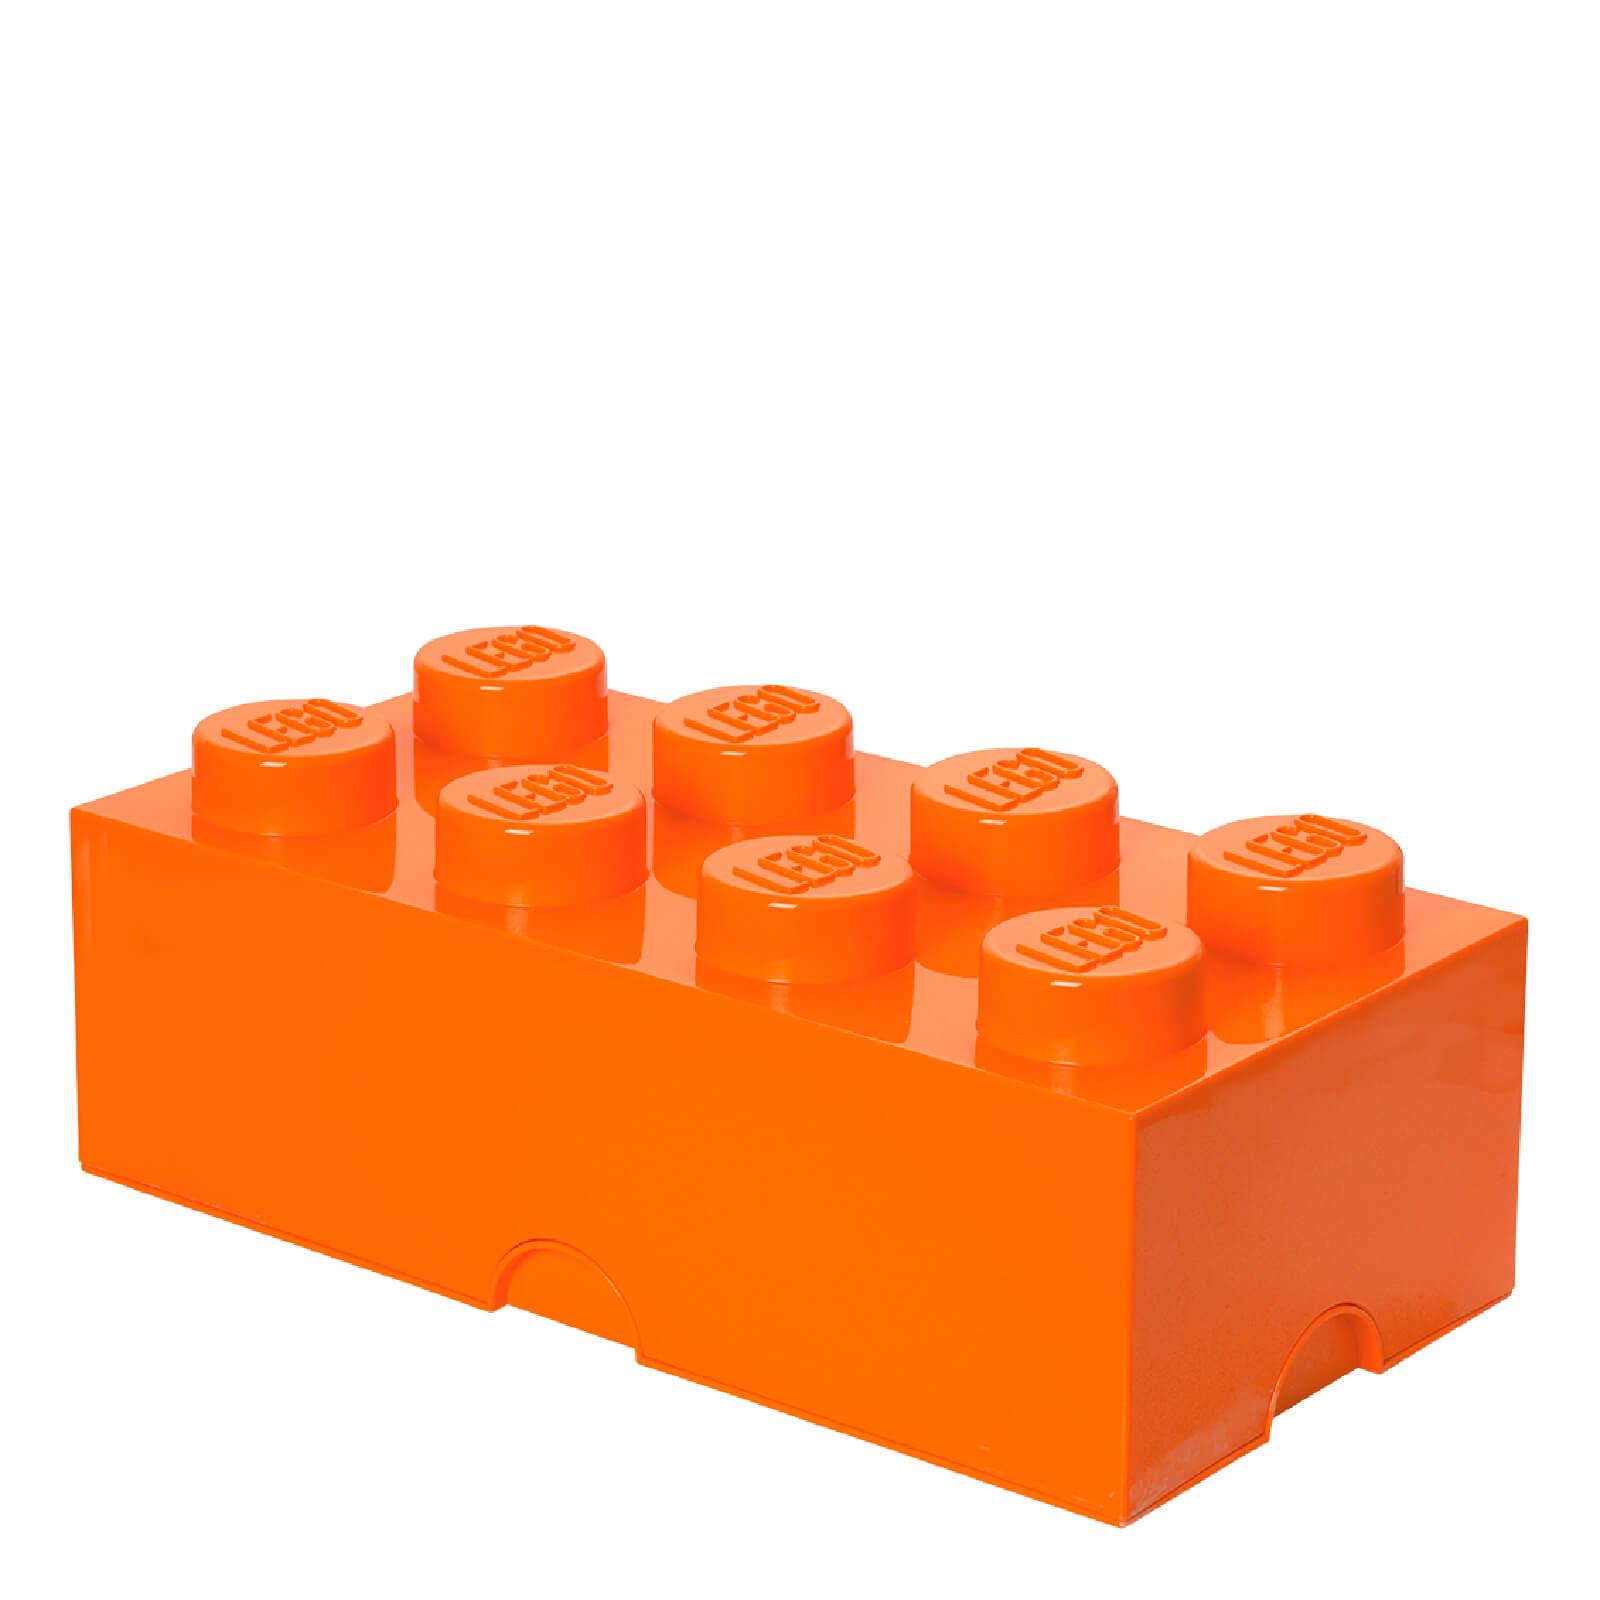 Lego Storage Brick 8 - Bright Orange